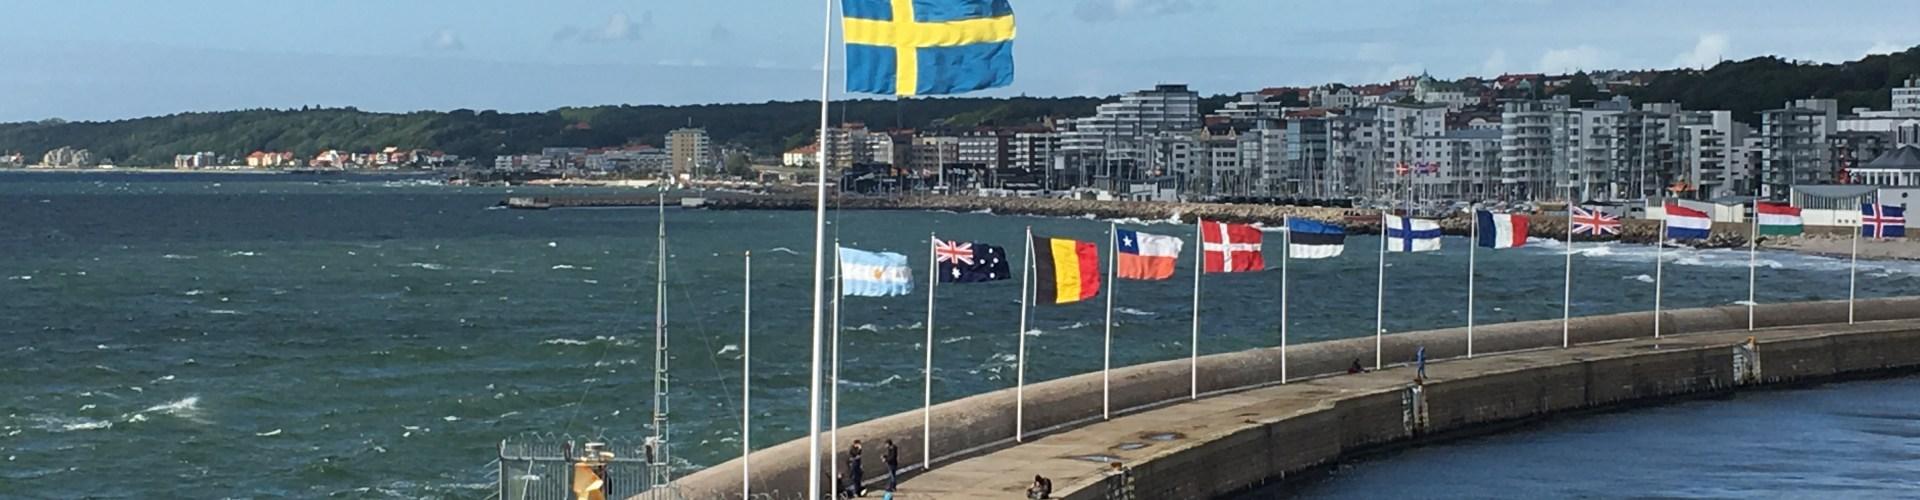 Tag 9 – Dänemark adieu ~ Hallo Schweden